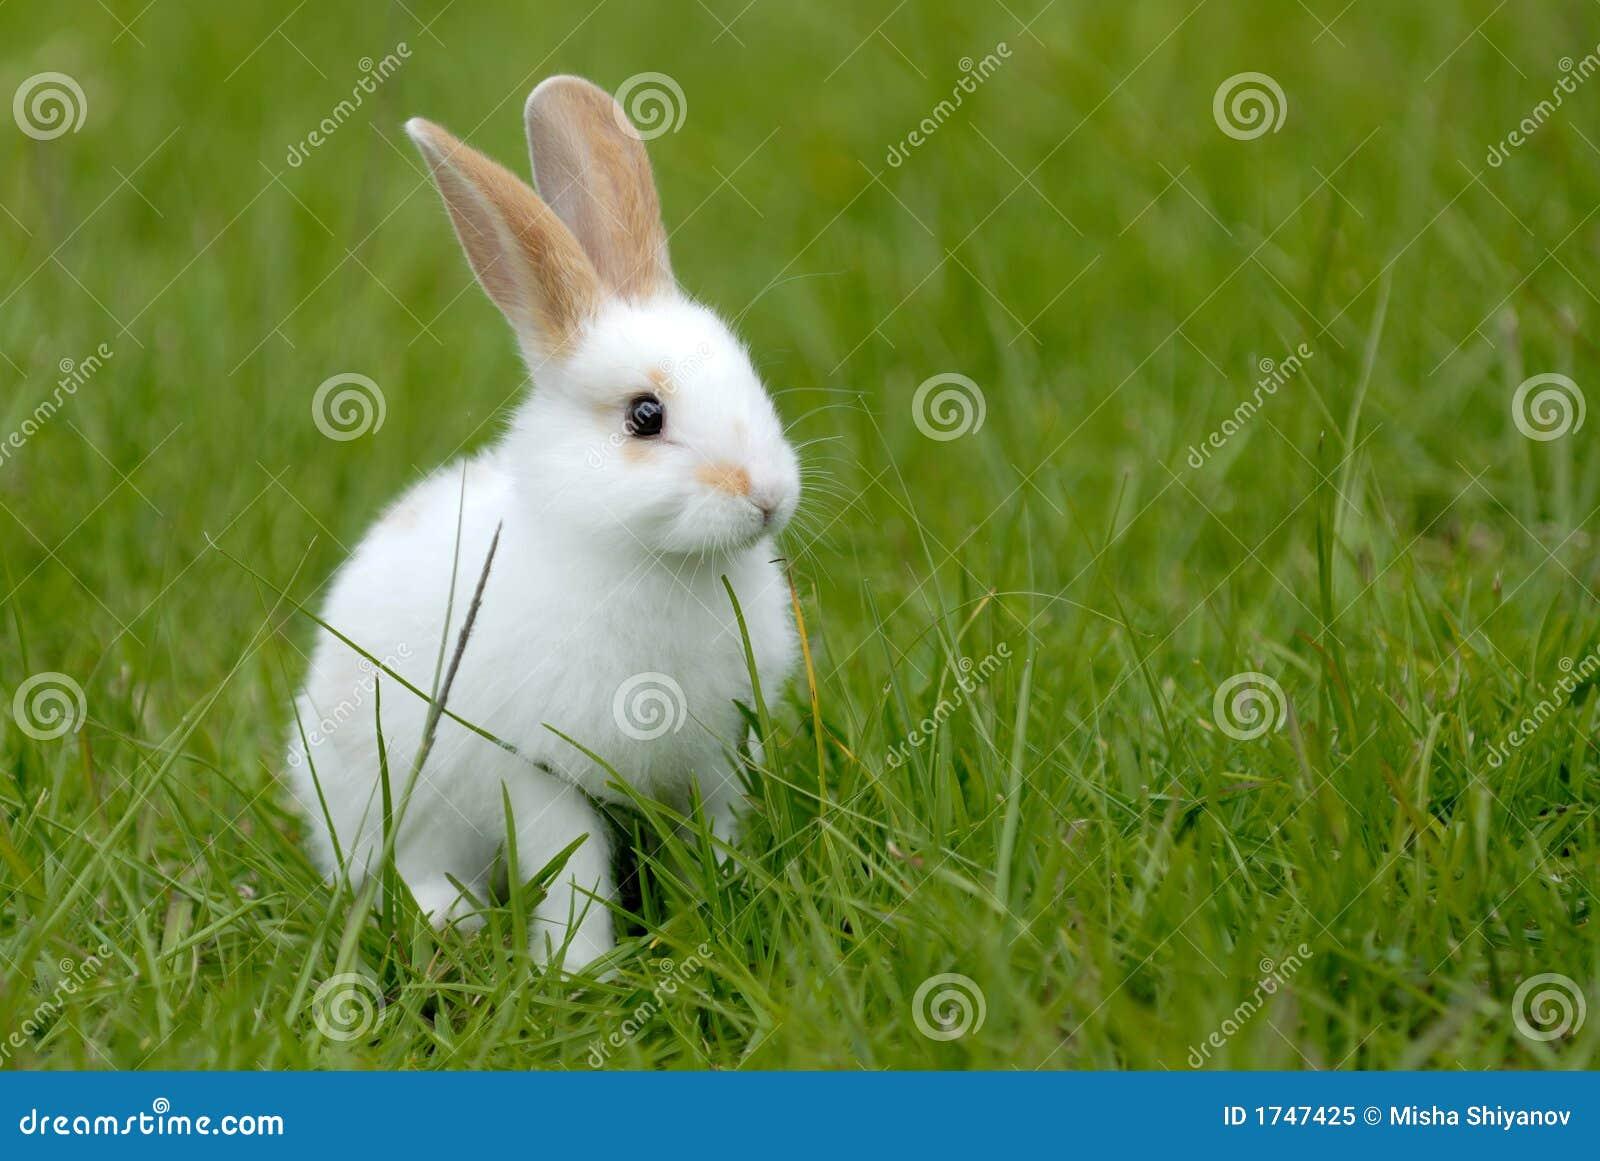 white rabbit on the grass royalty free stock photo   image